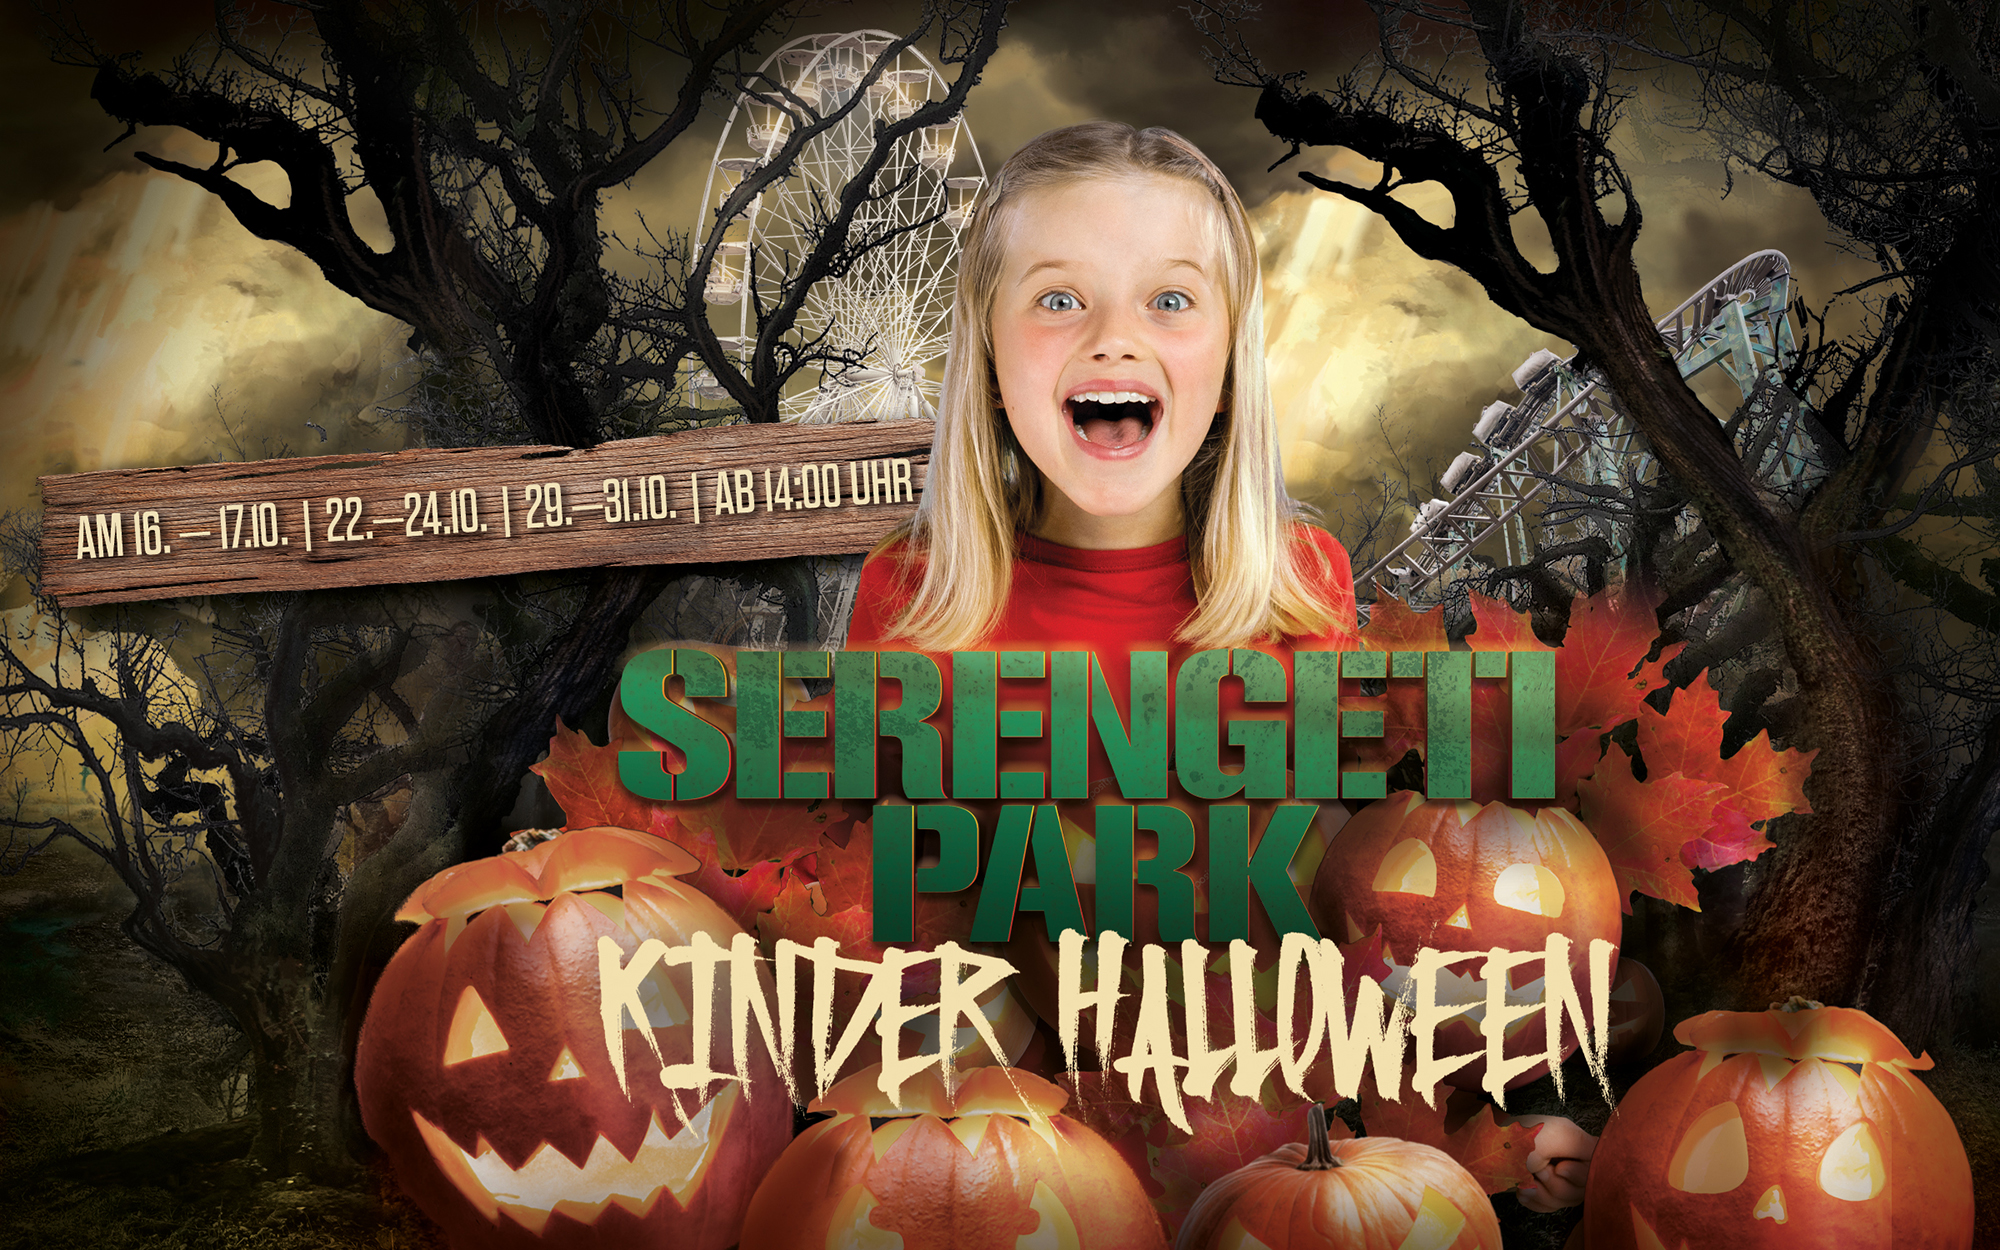 Kinder-Halloween im Serengeti-Park